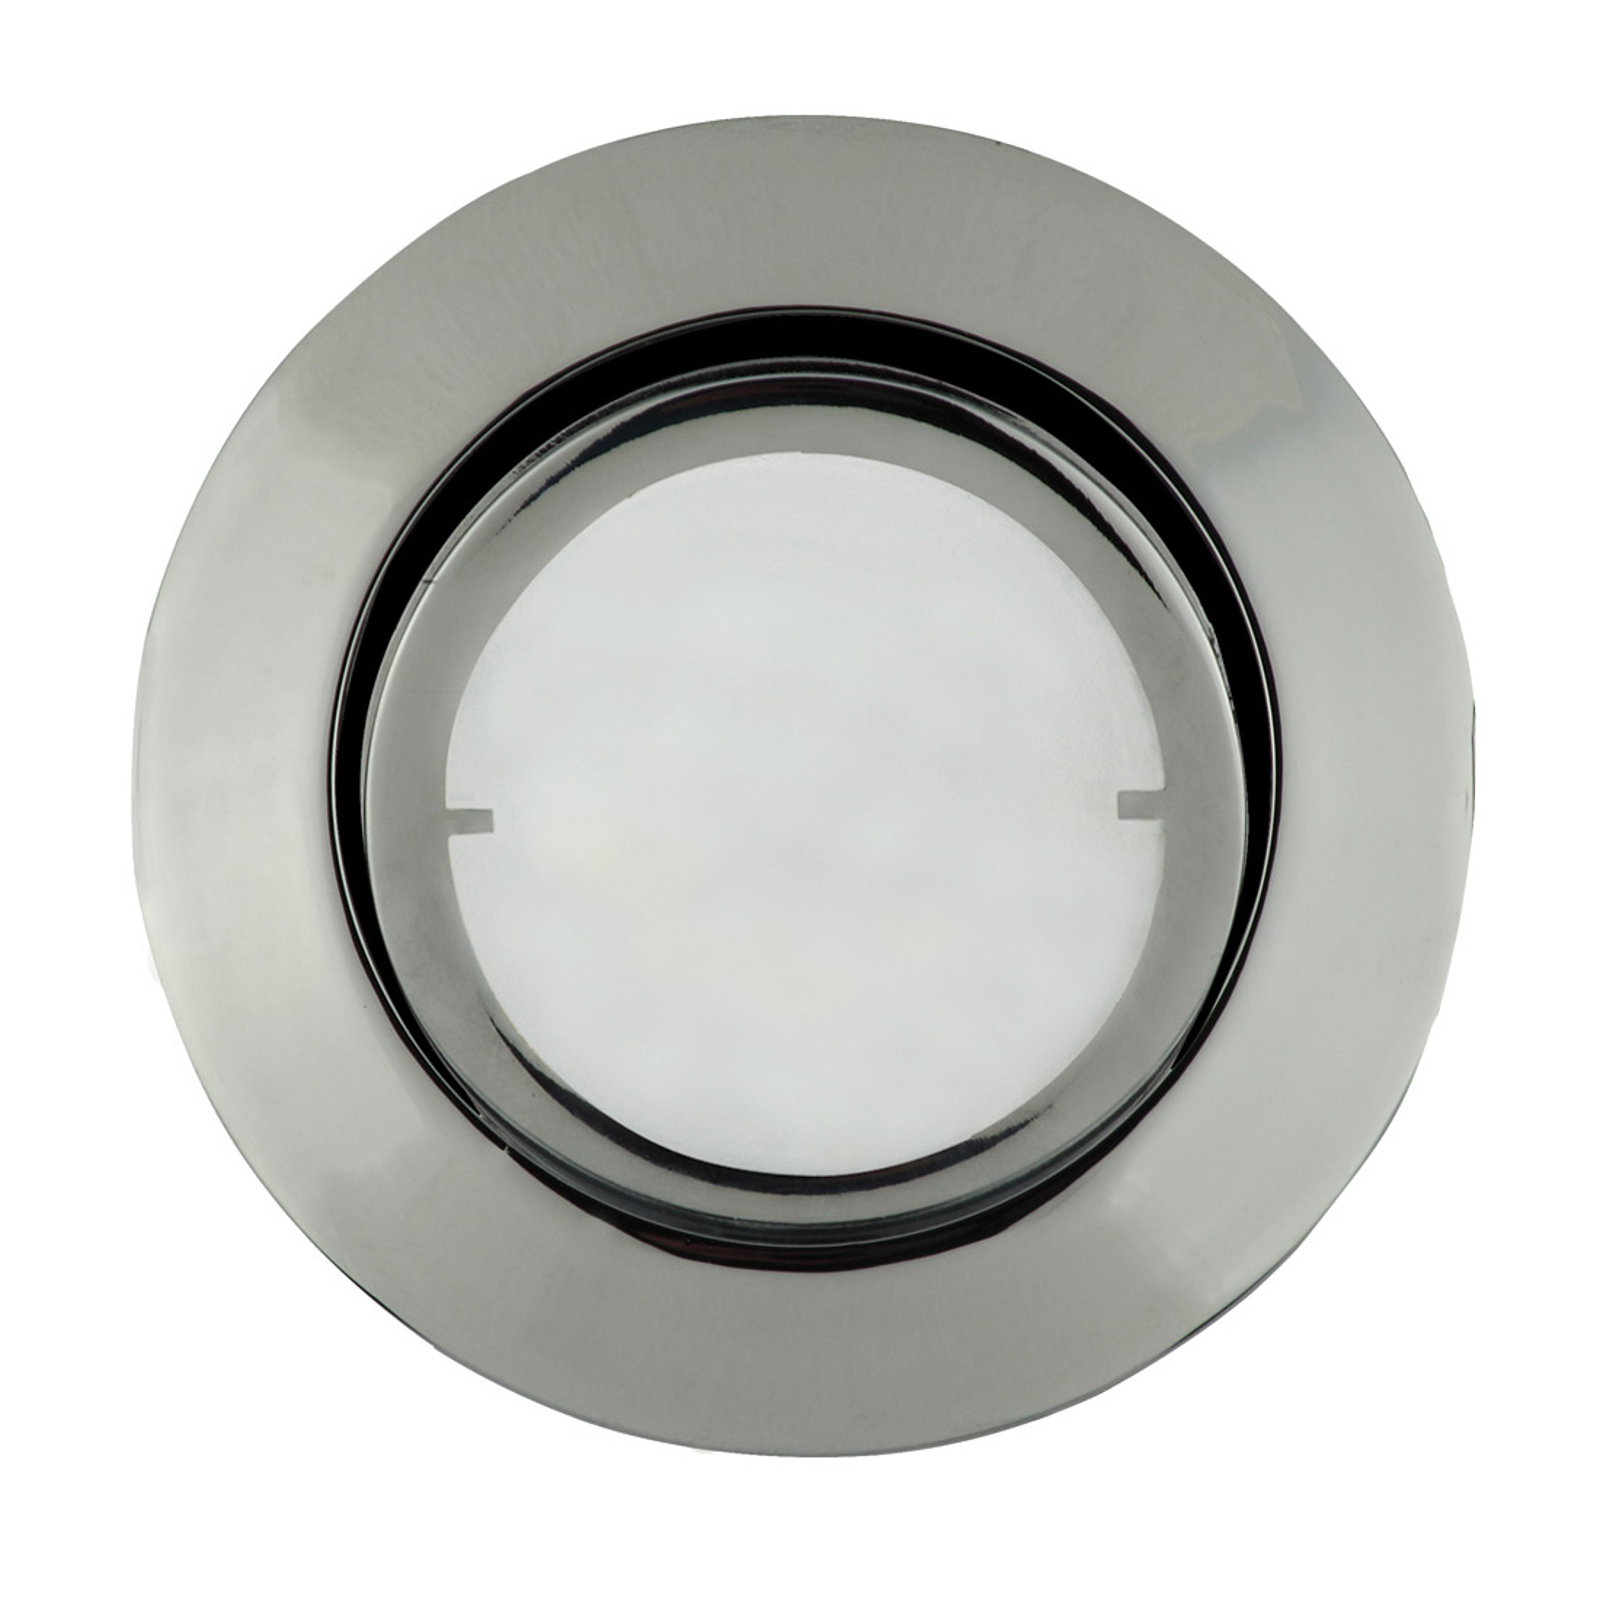 Ronde LED inbouwlamp Joanie, chroom